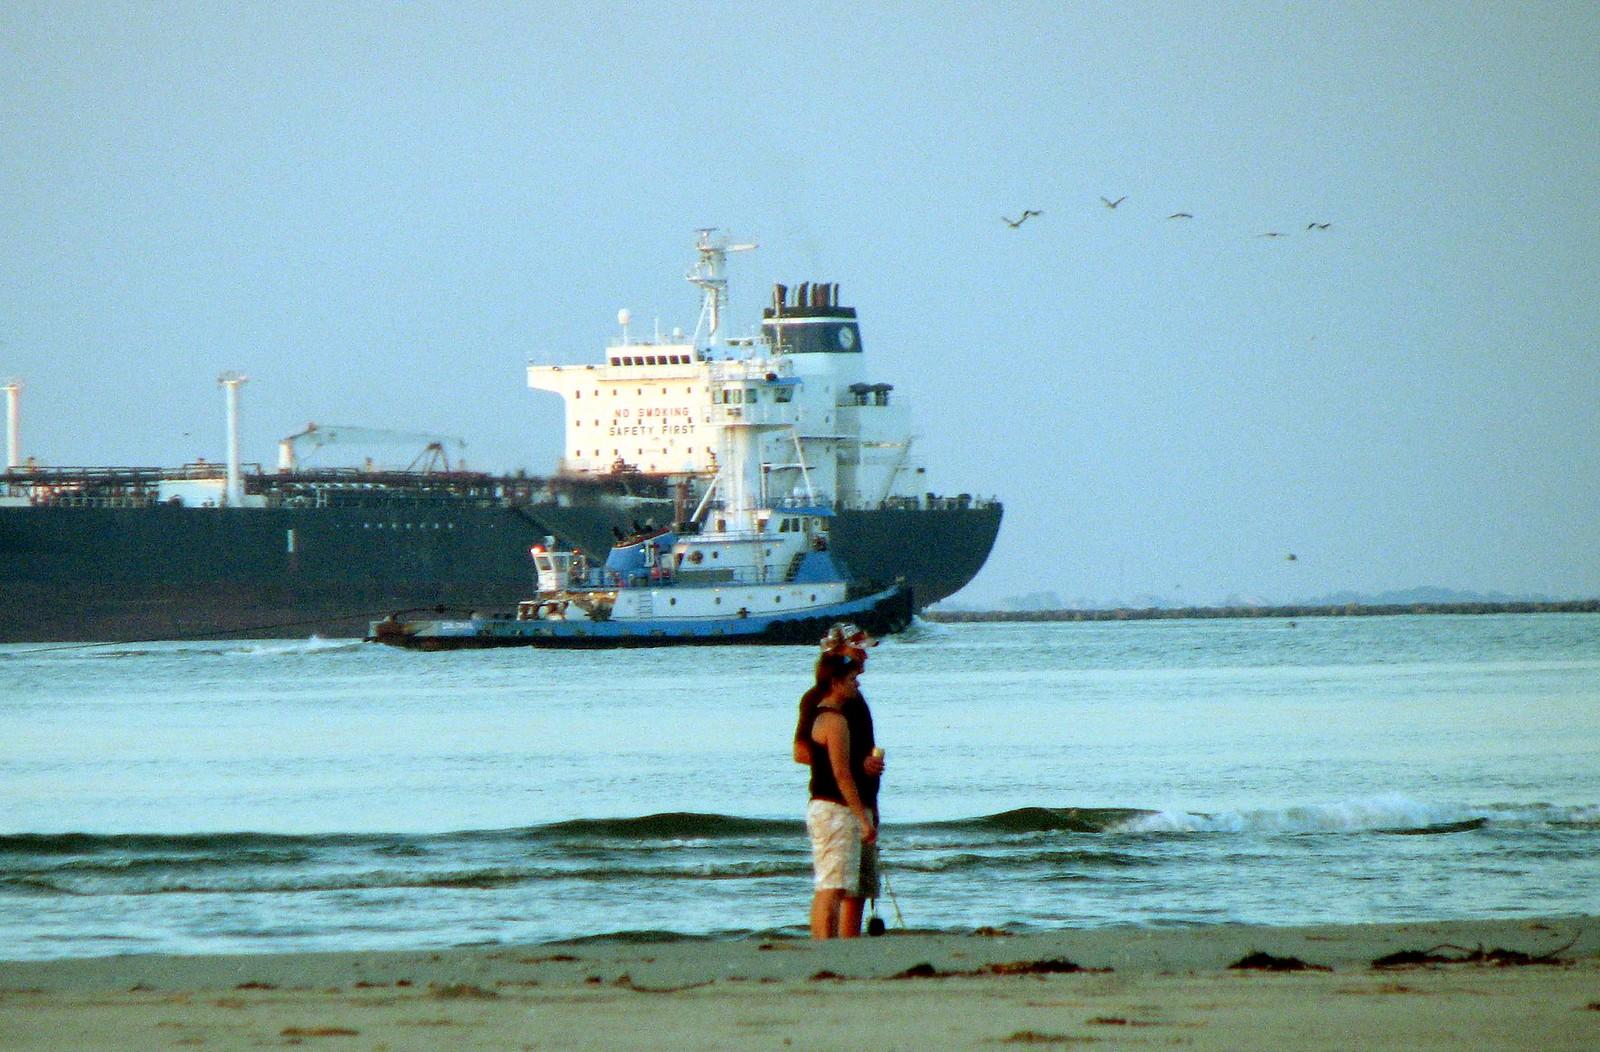 Galveston/Houston Ship Channel